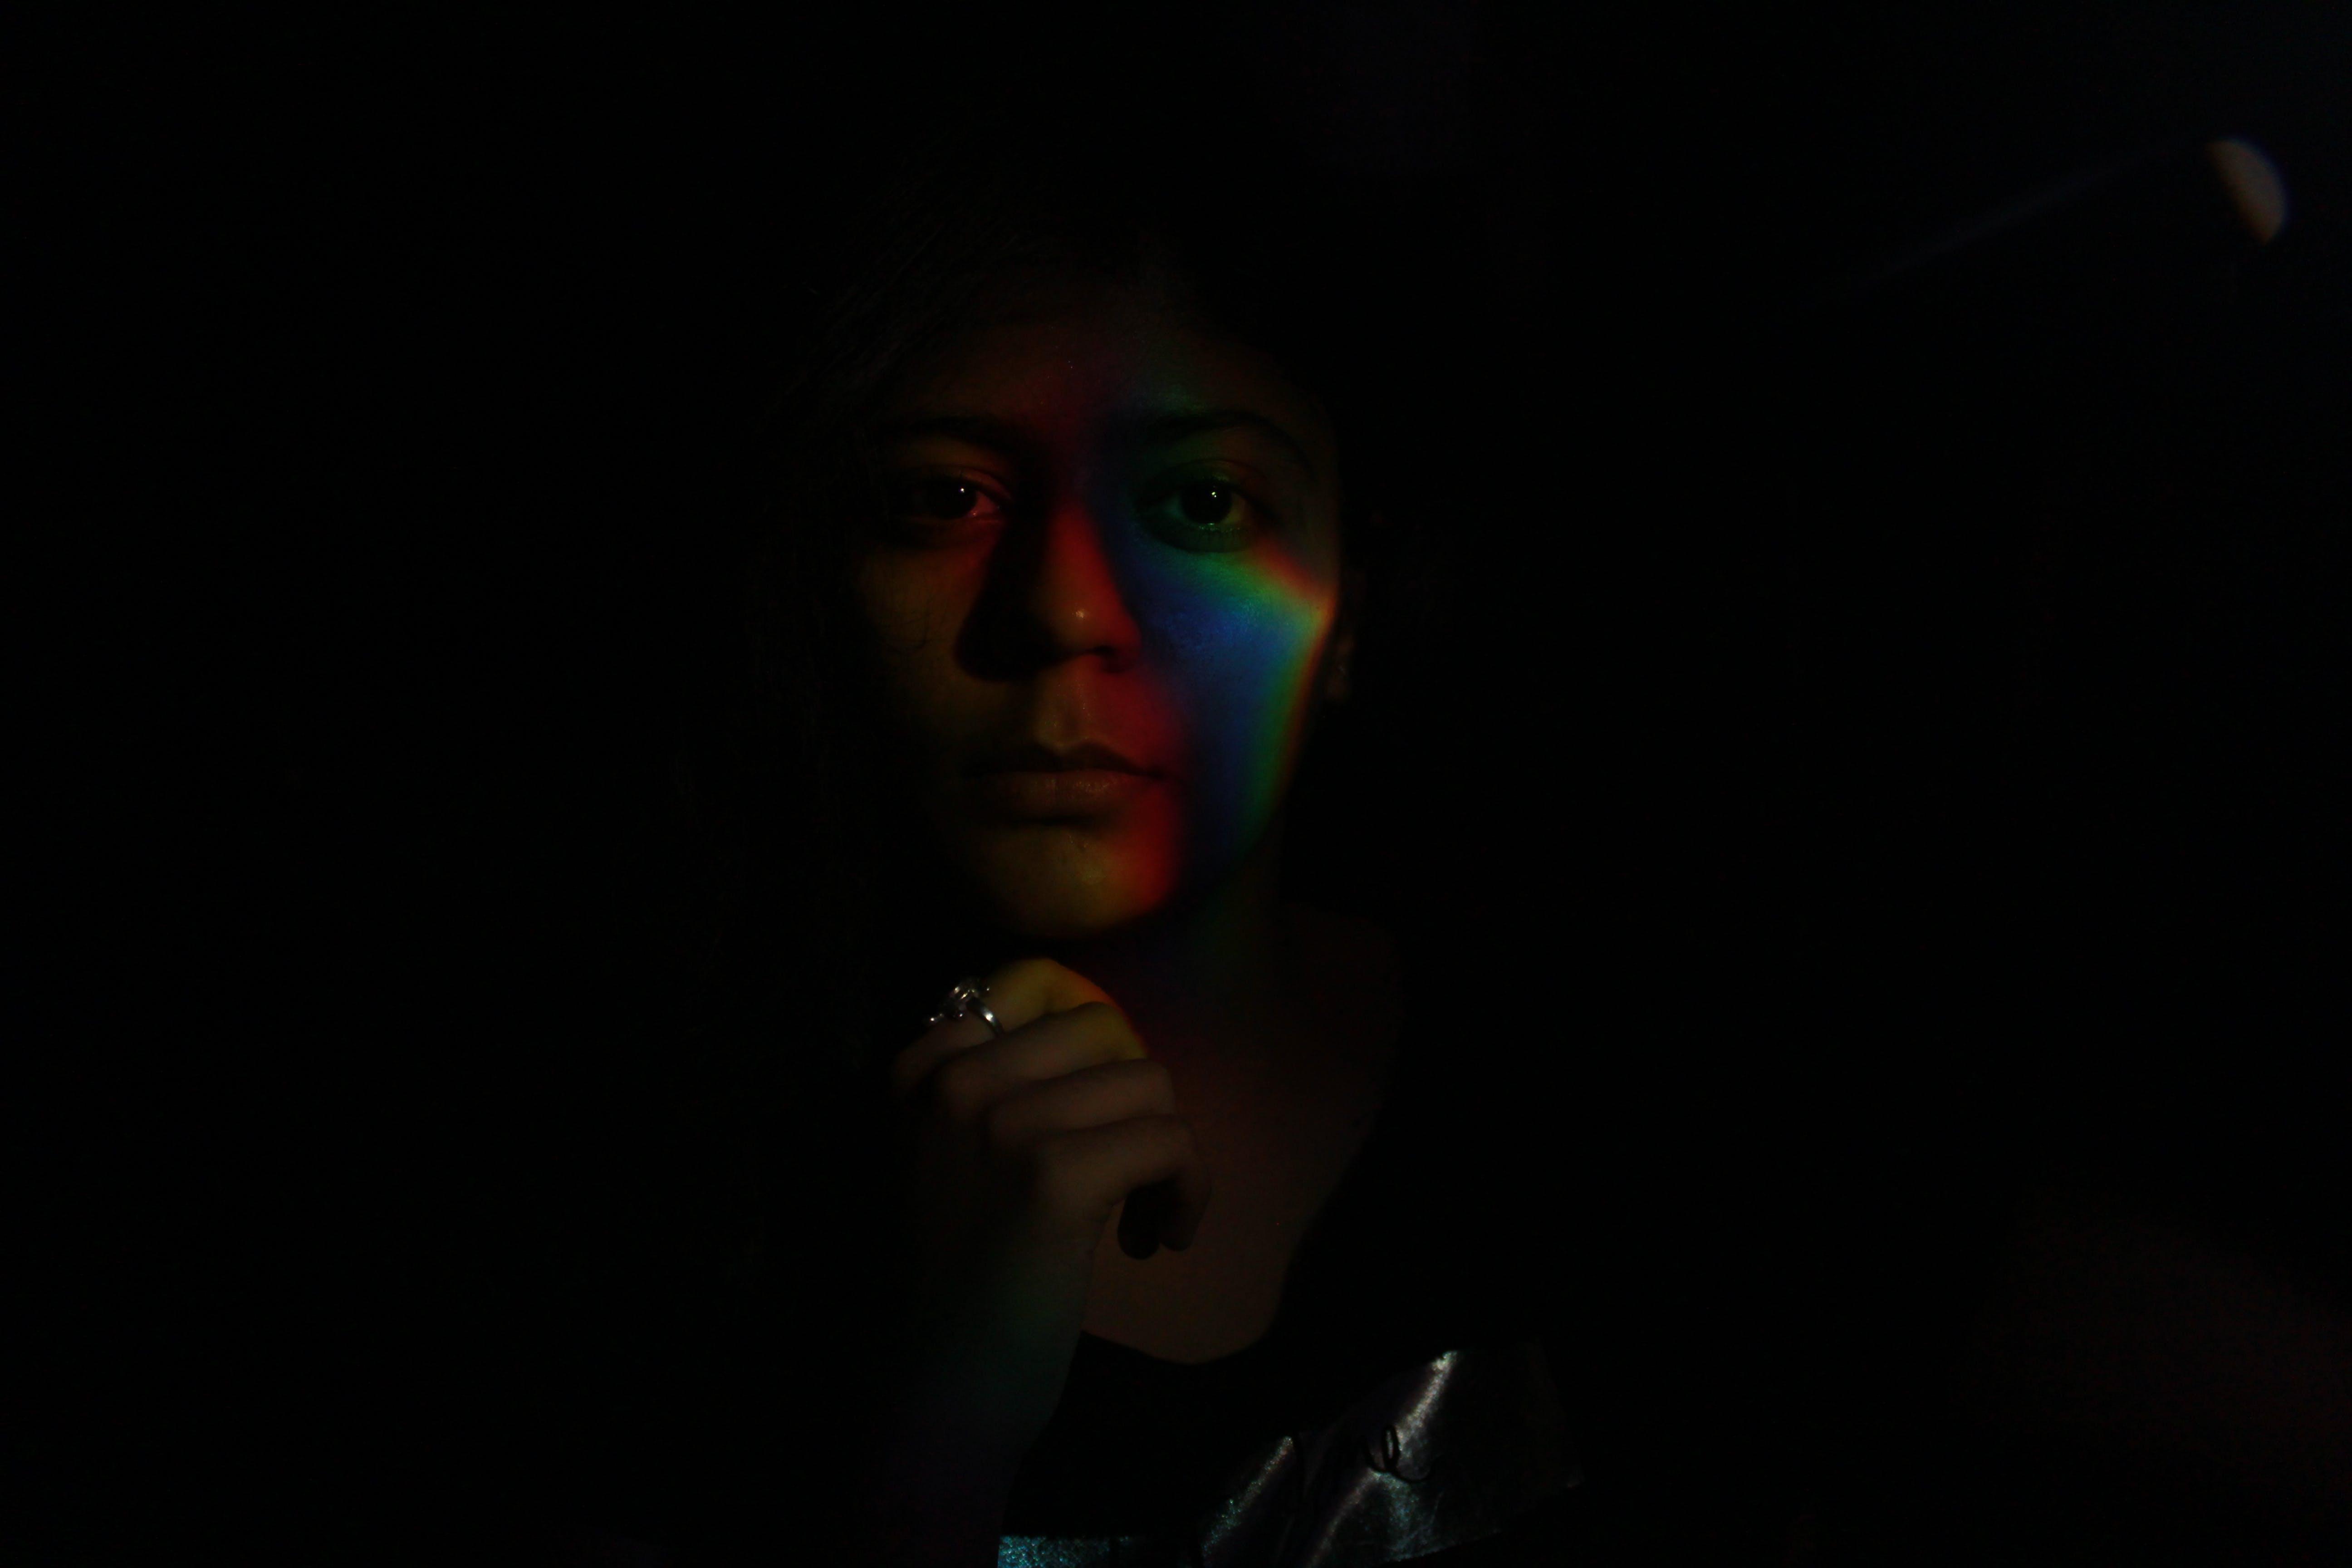 Free stock photo of rainbow colors